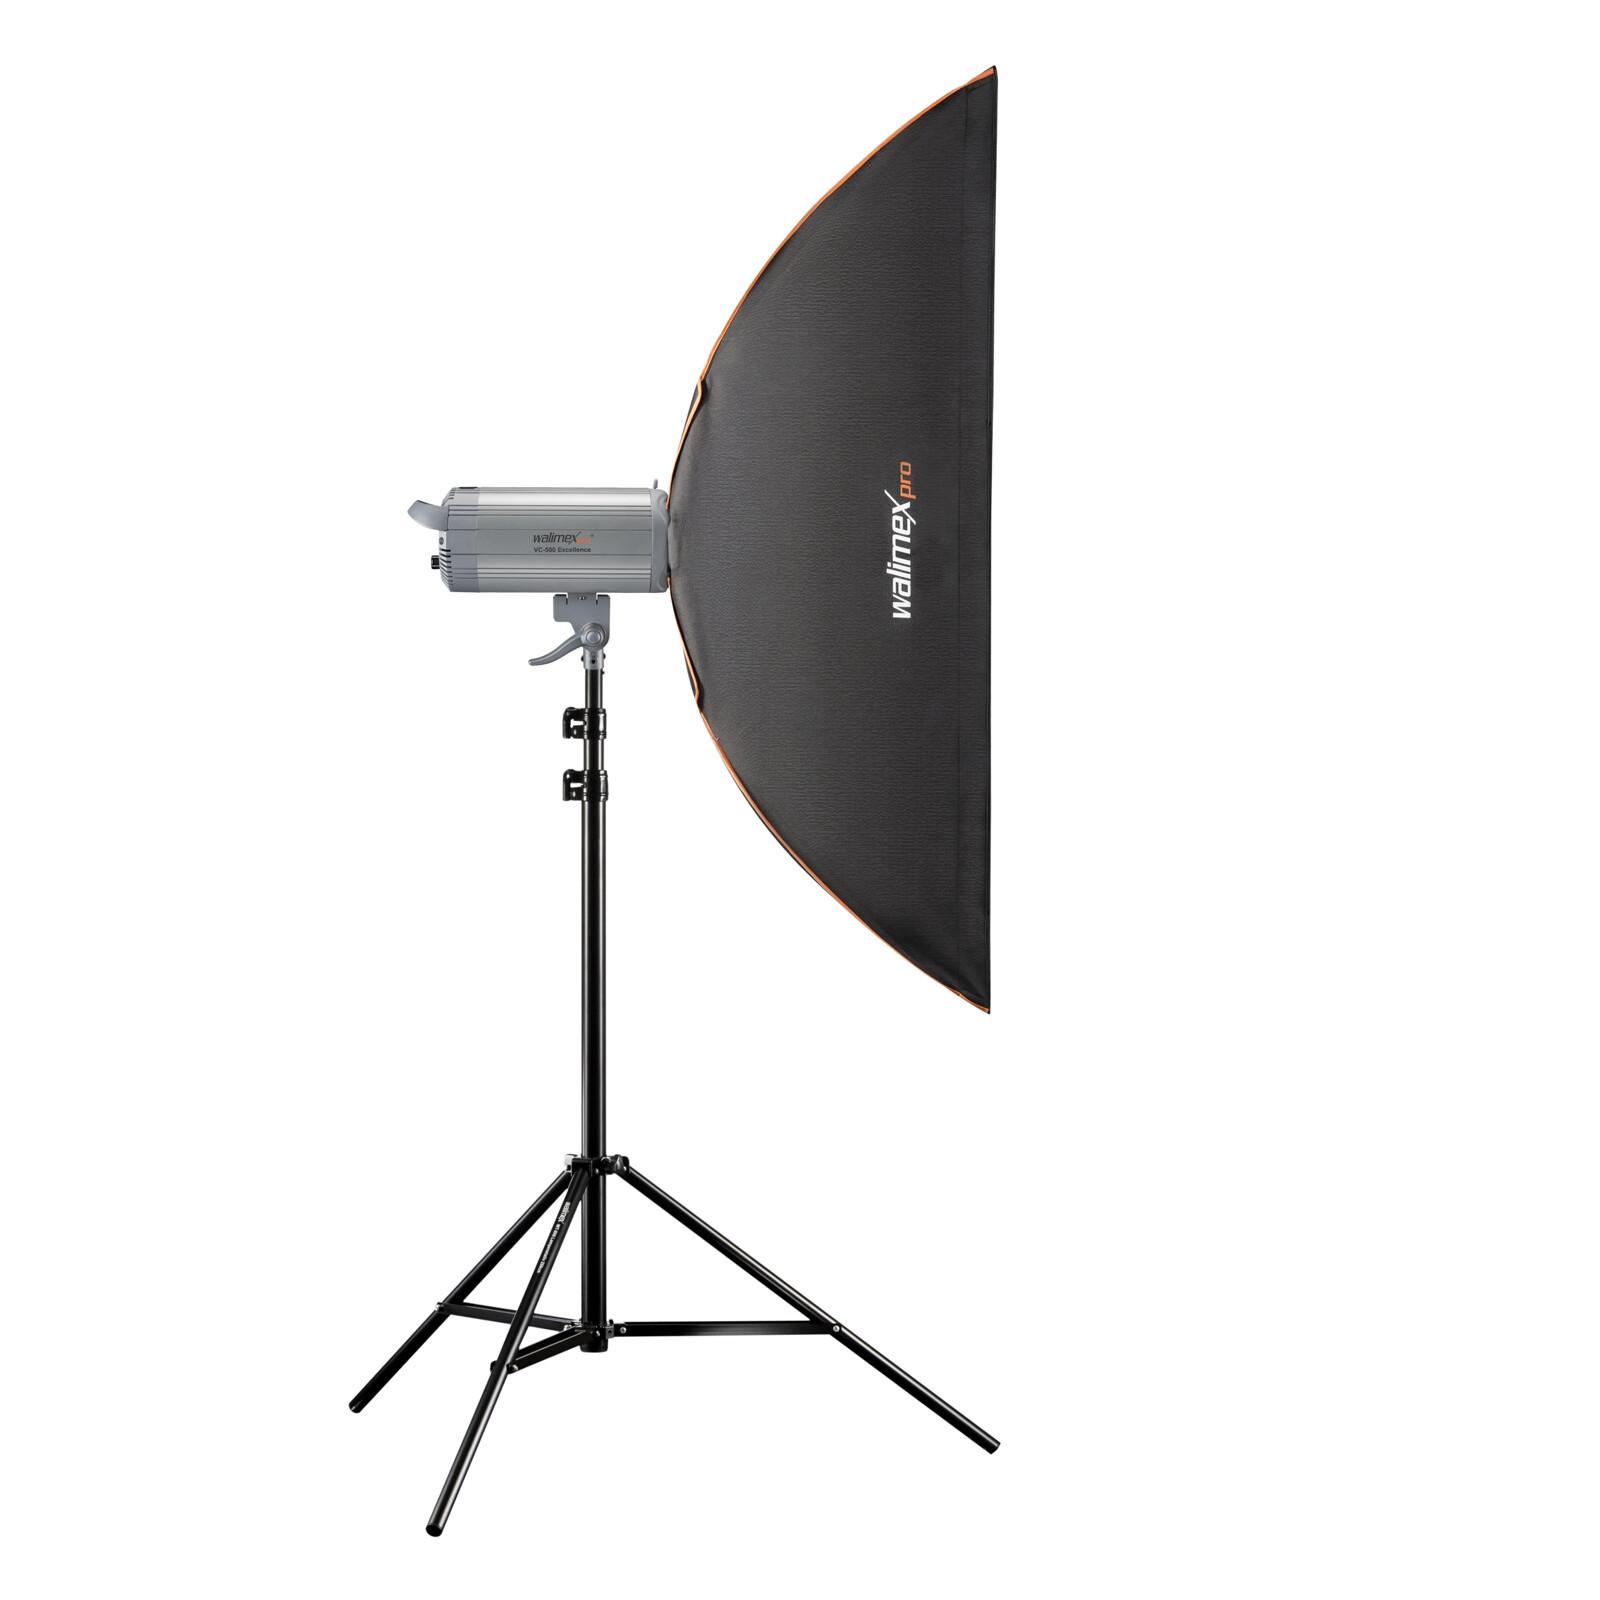 walimex pro VC Excellence Studioset Advance 500